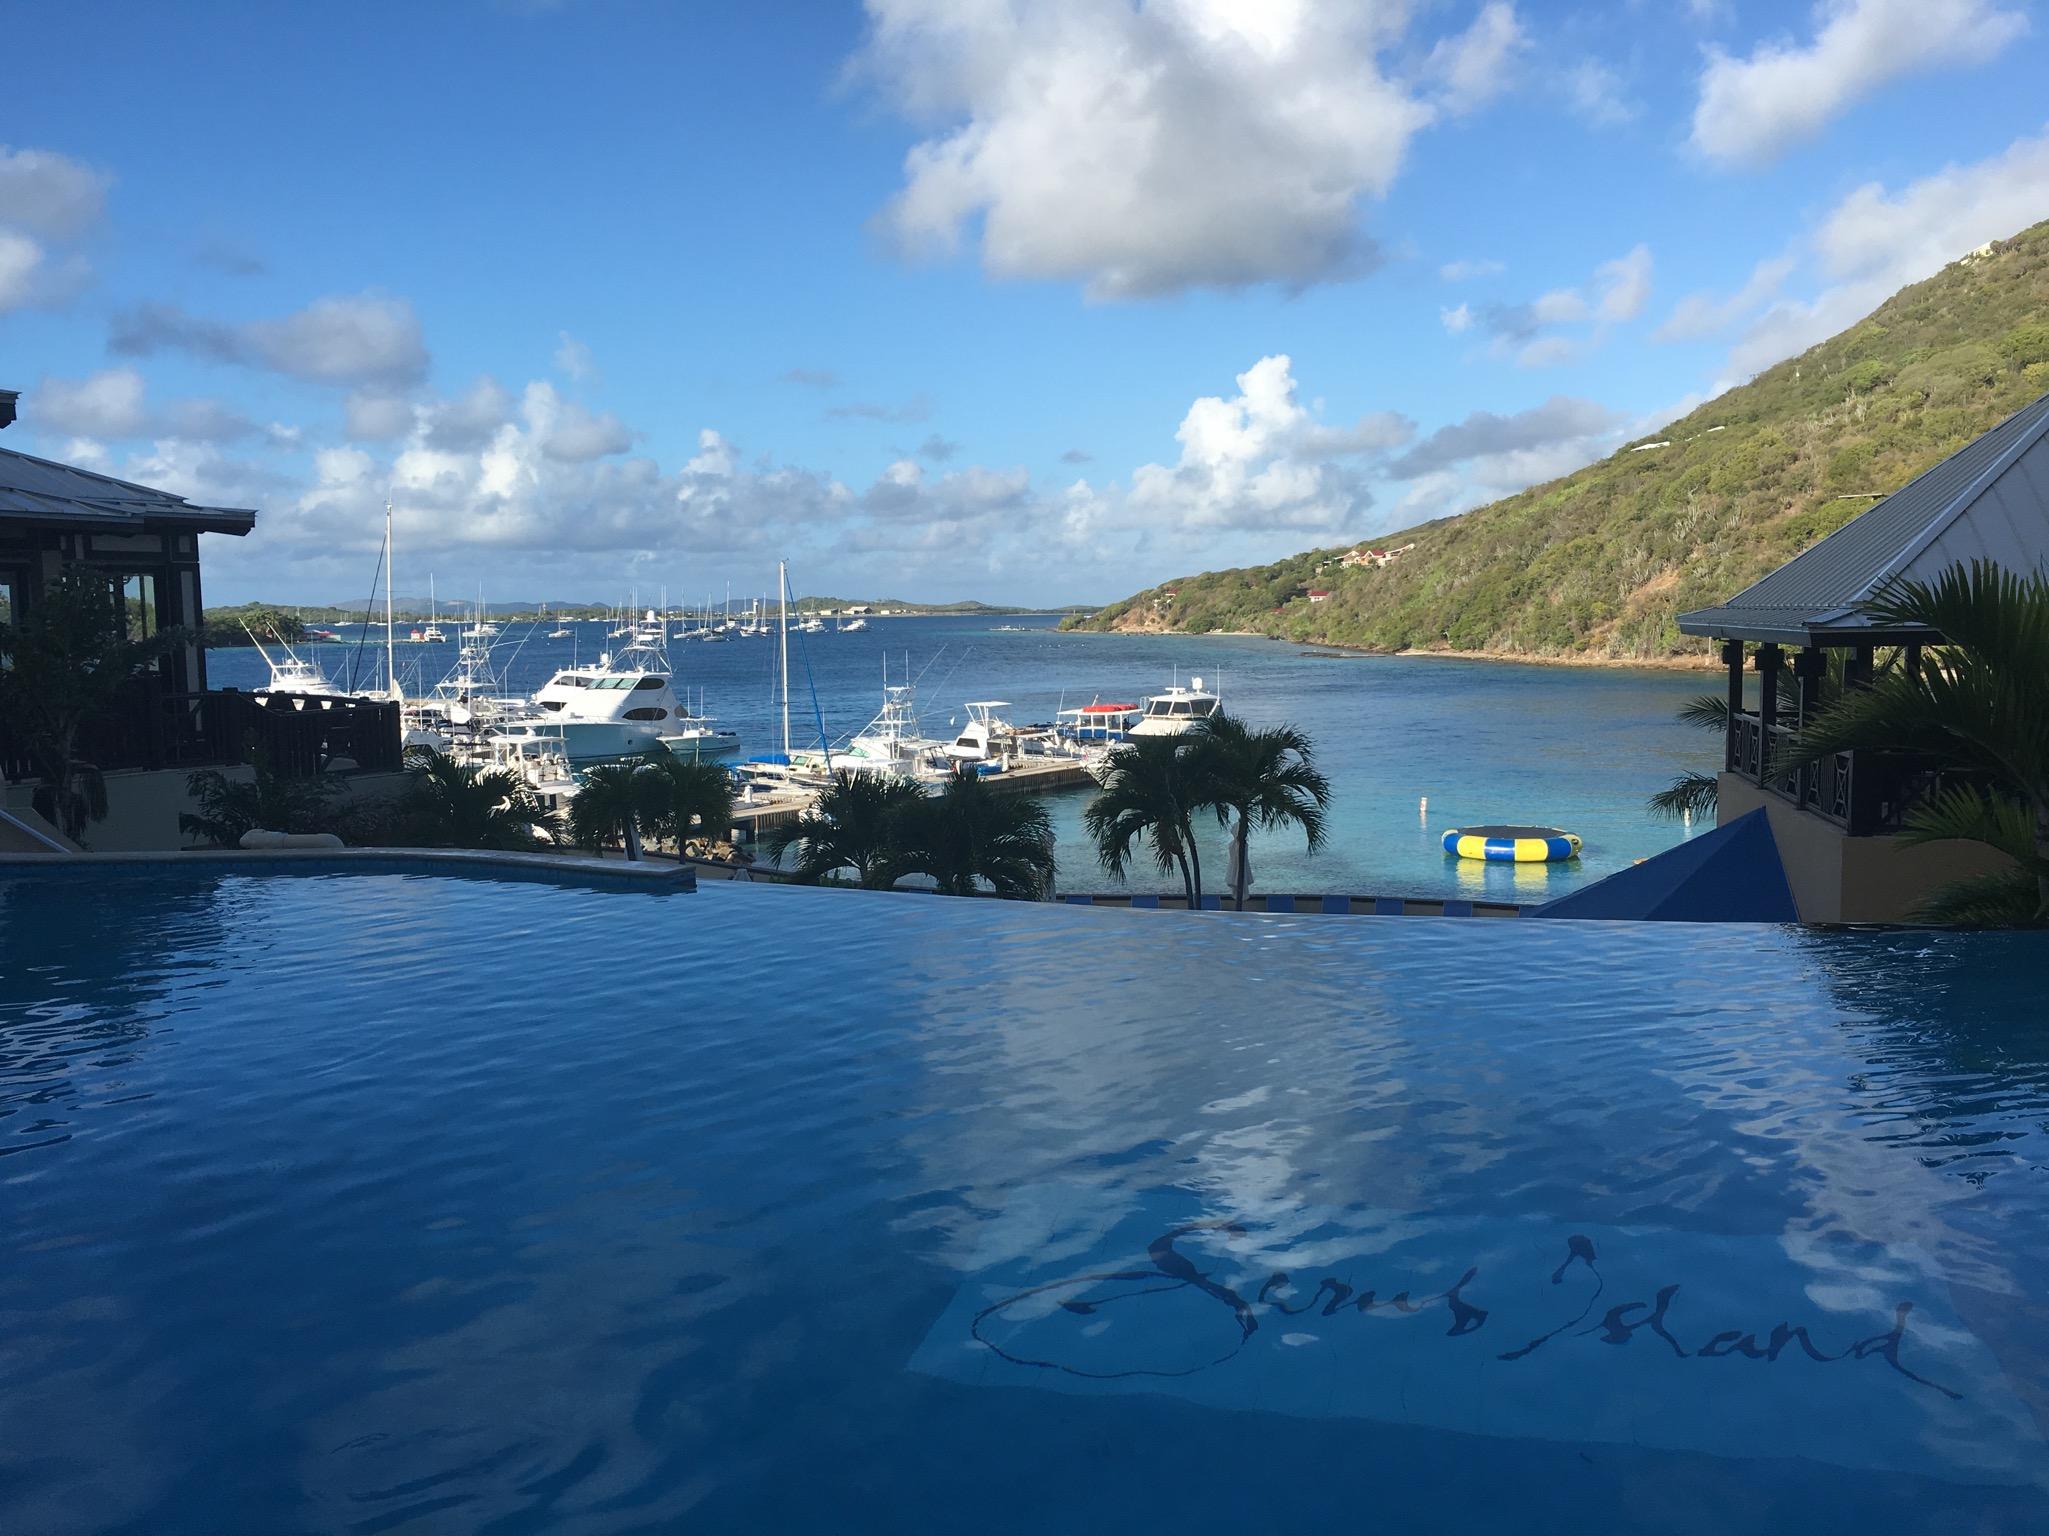 scrub-island-pool-sign-5